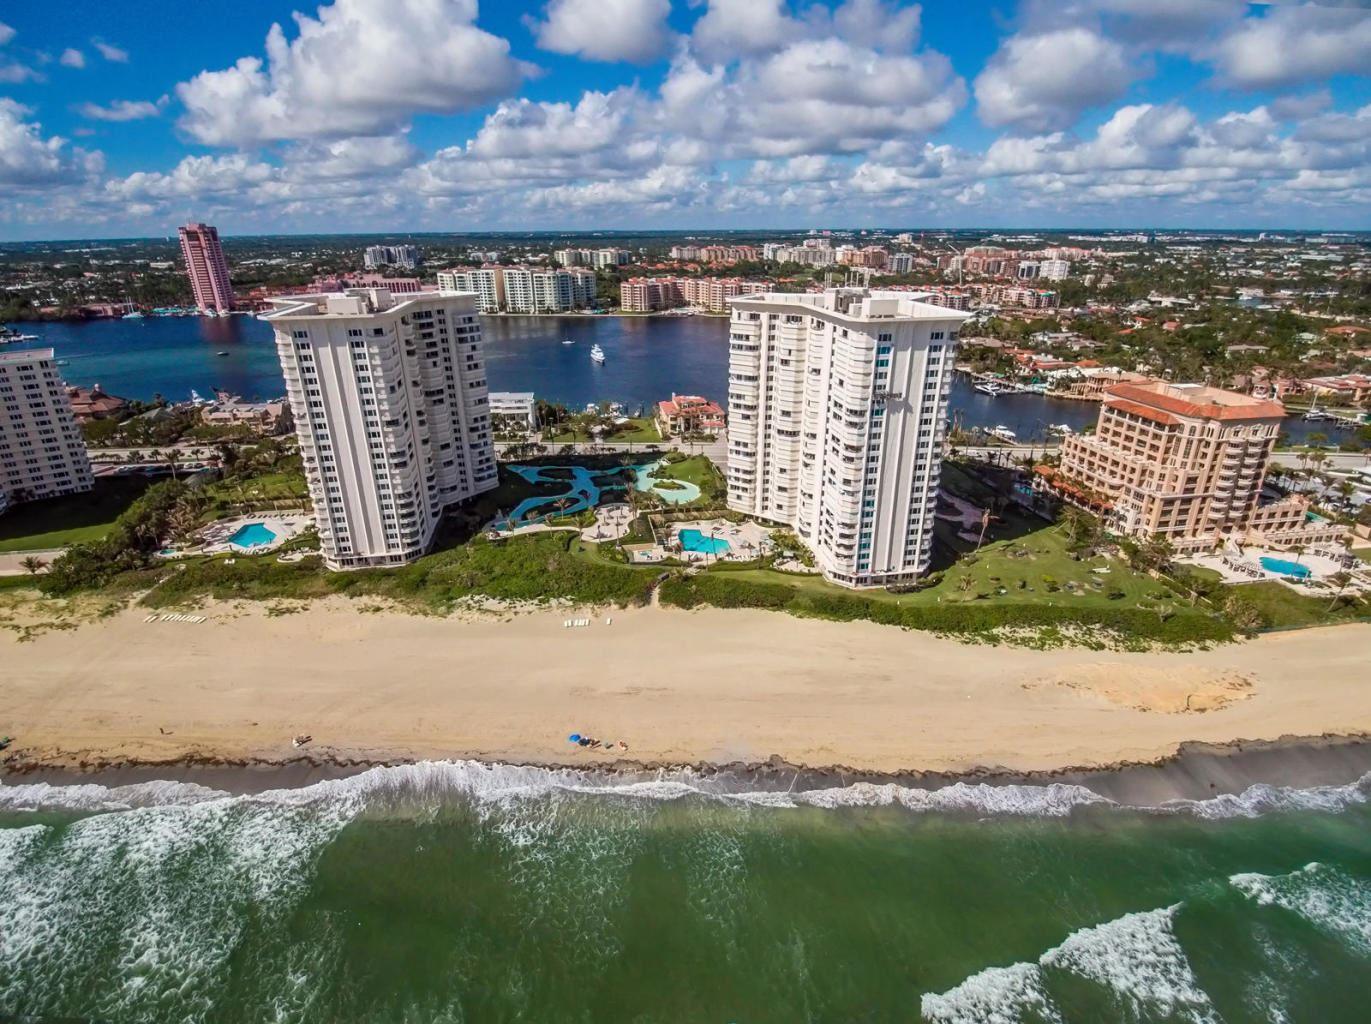 550 S Ocean Boulevard #805, Boca Raton, FL 33432 - #: RX-10651351